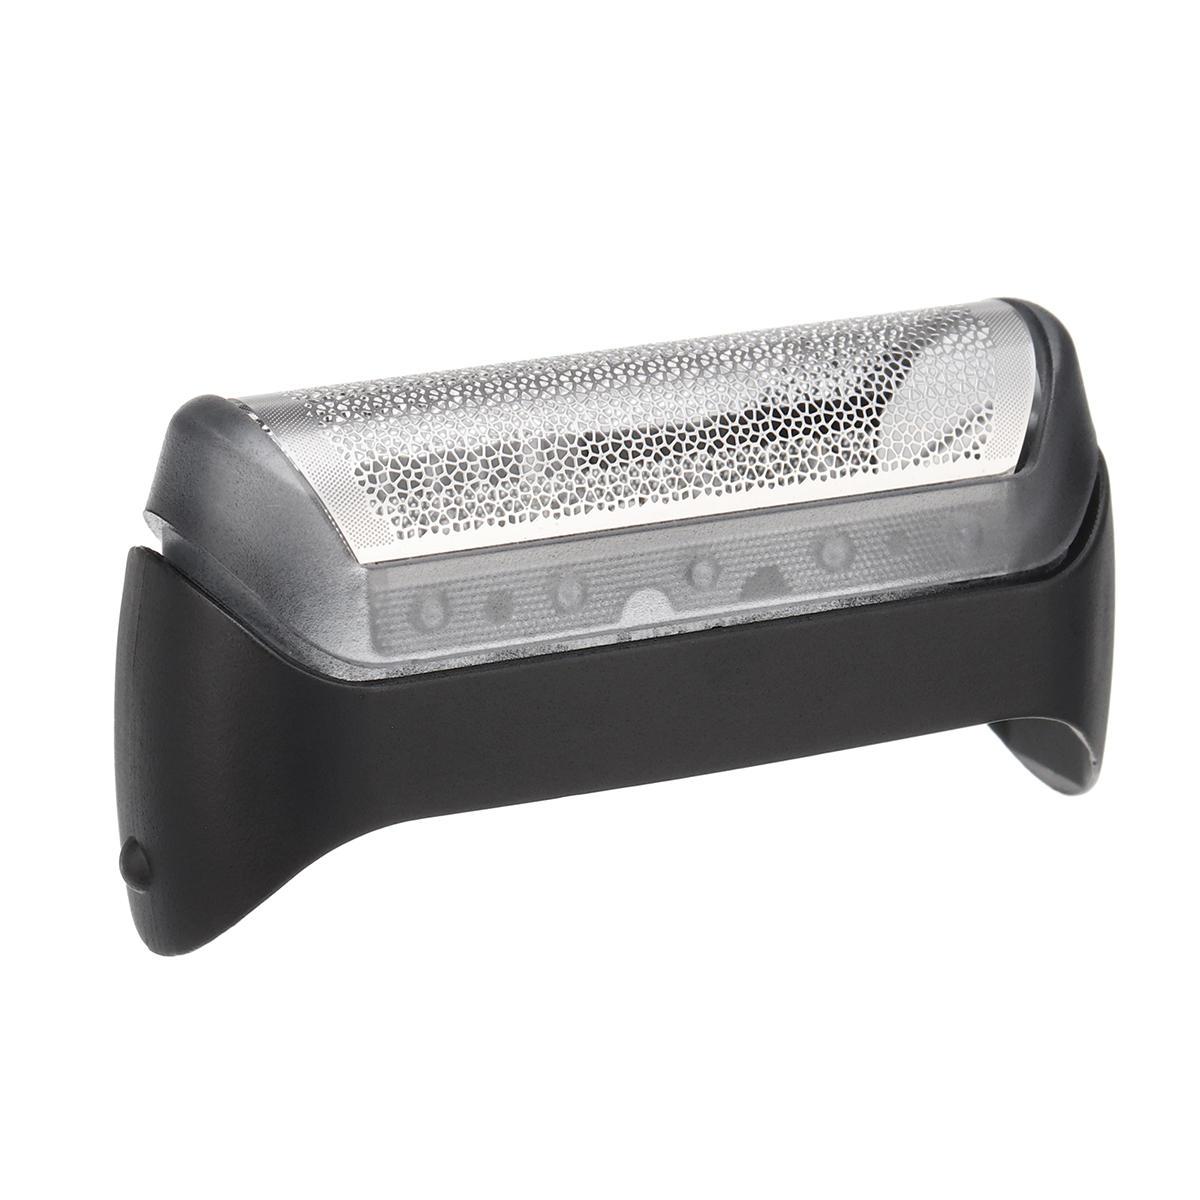 10B Shaver Foil Replacement For Braun FreeControl 1735 1775 170 180 Series 1 170 180 190 Shaver Screen Foil Razor Mesh Grid